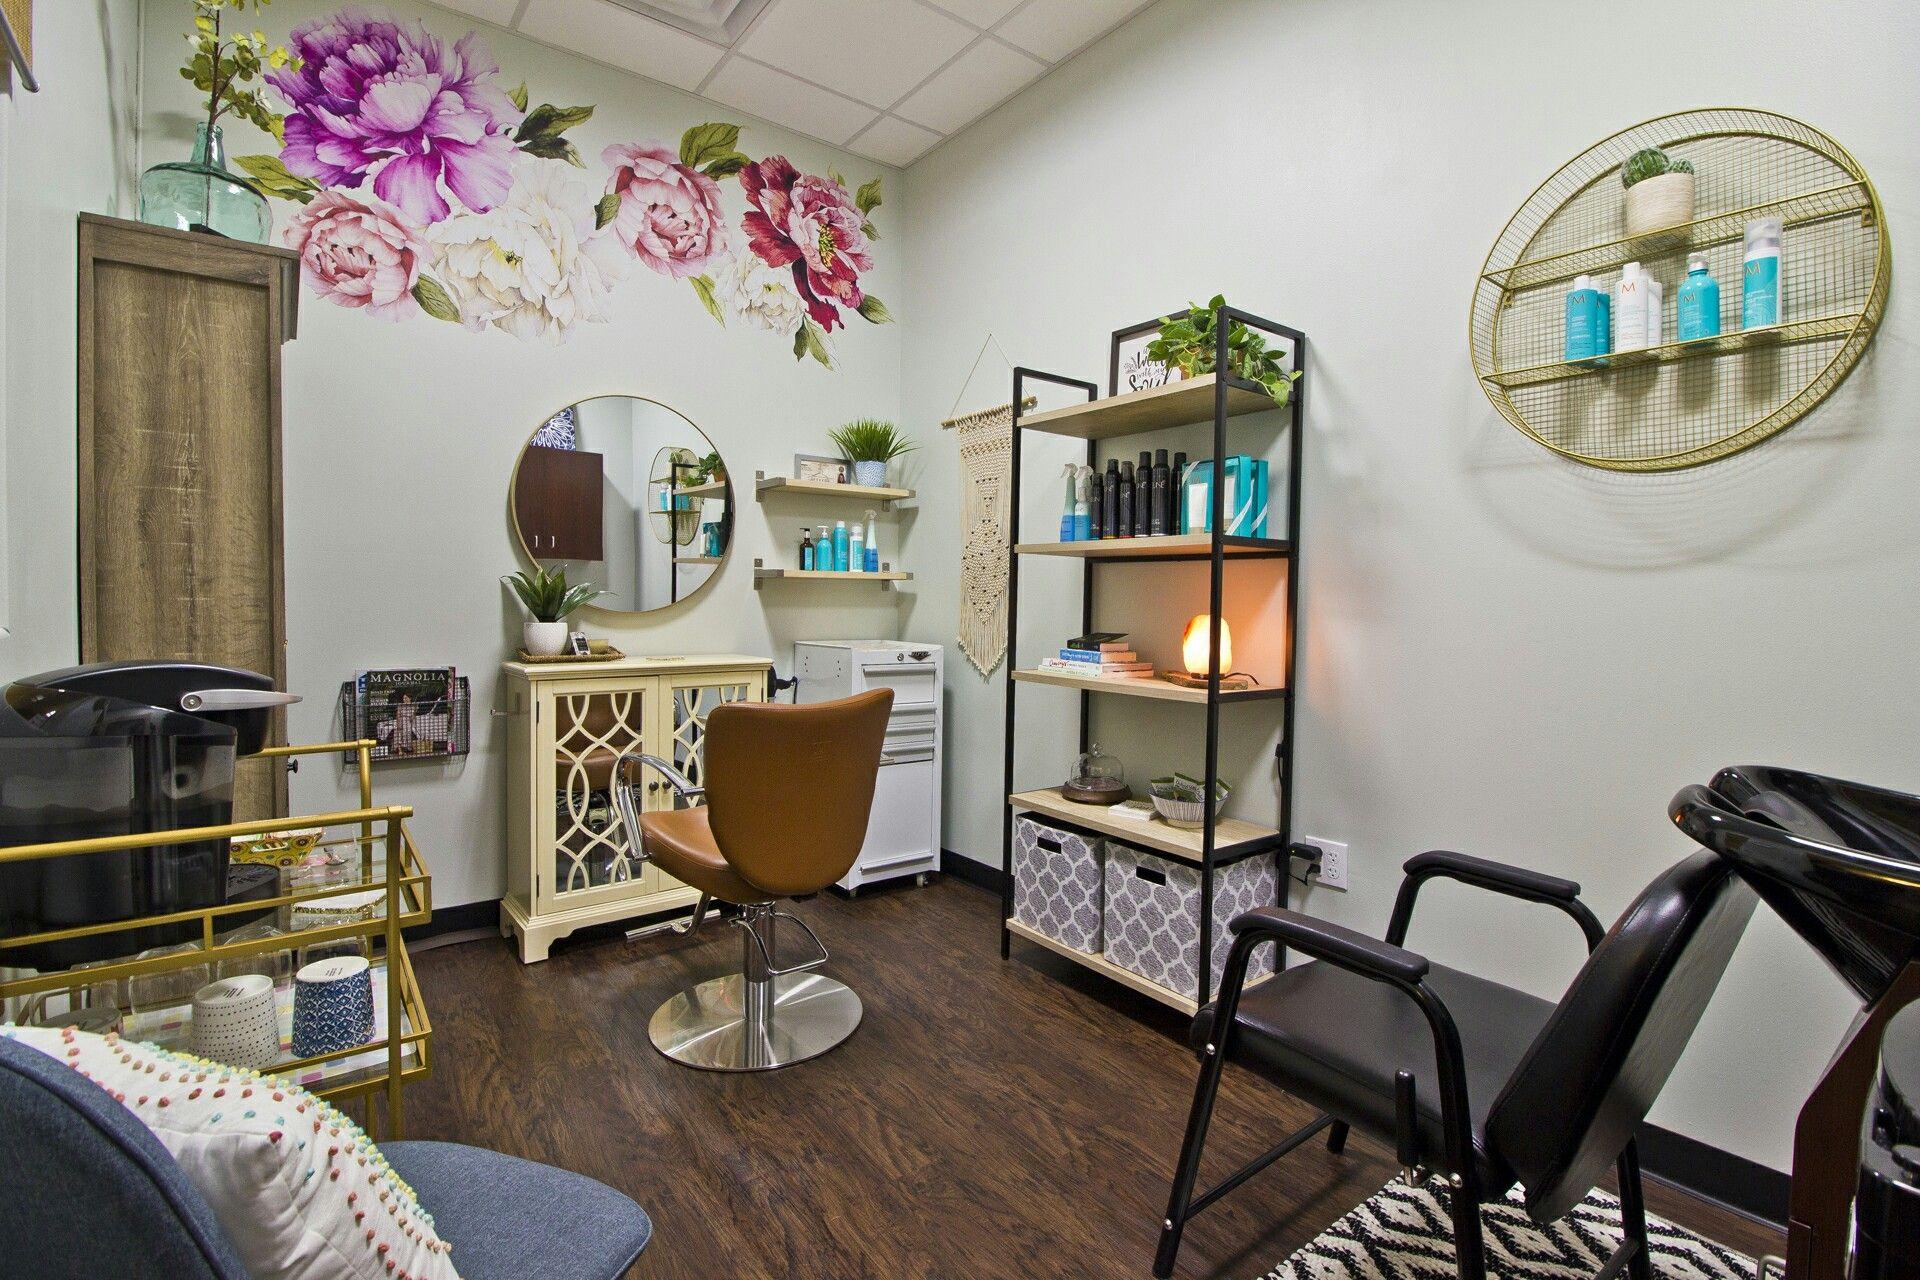 Union Salon Studio Phenix Salon Suite Ocala Fl Salon Suite Phenix Salon Suites Salon Studio